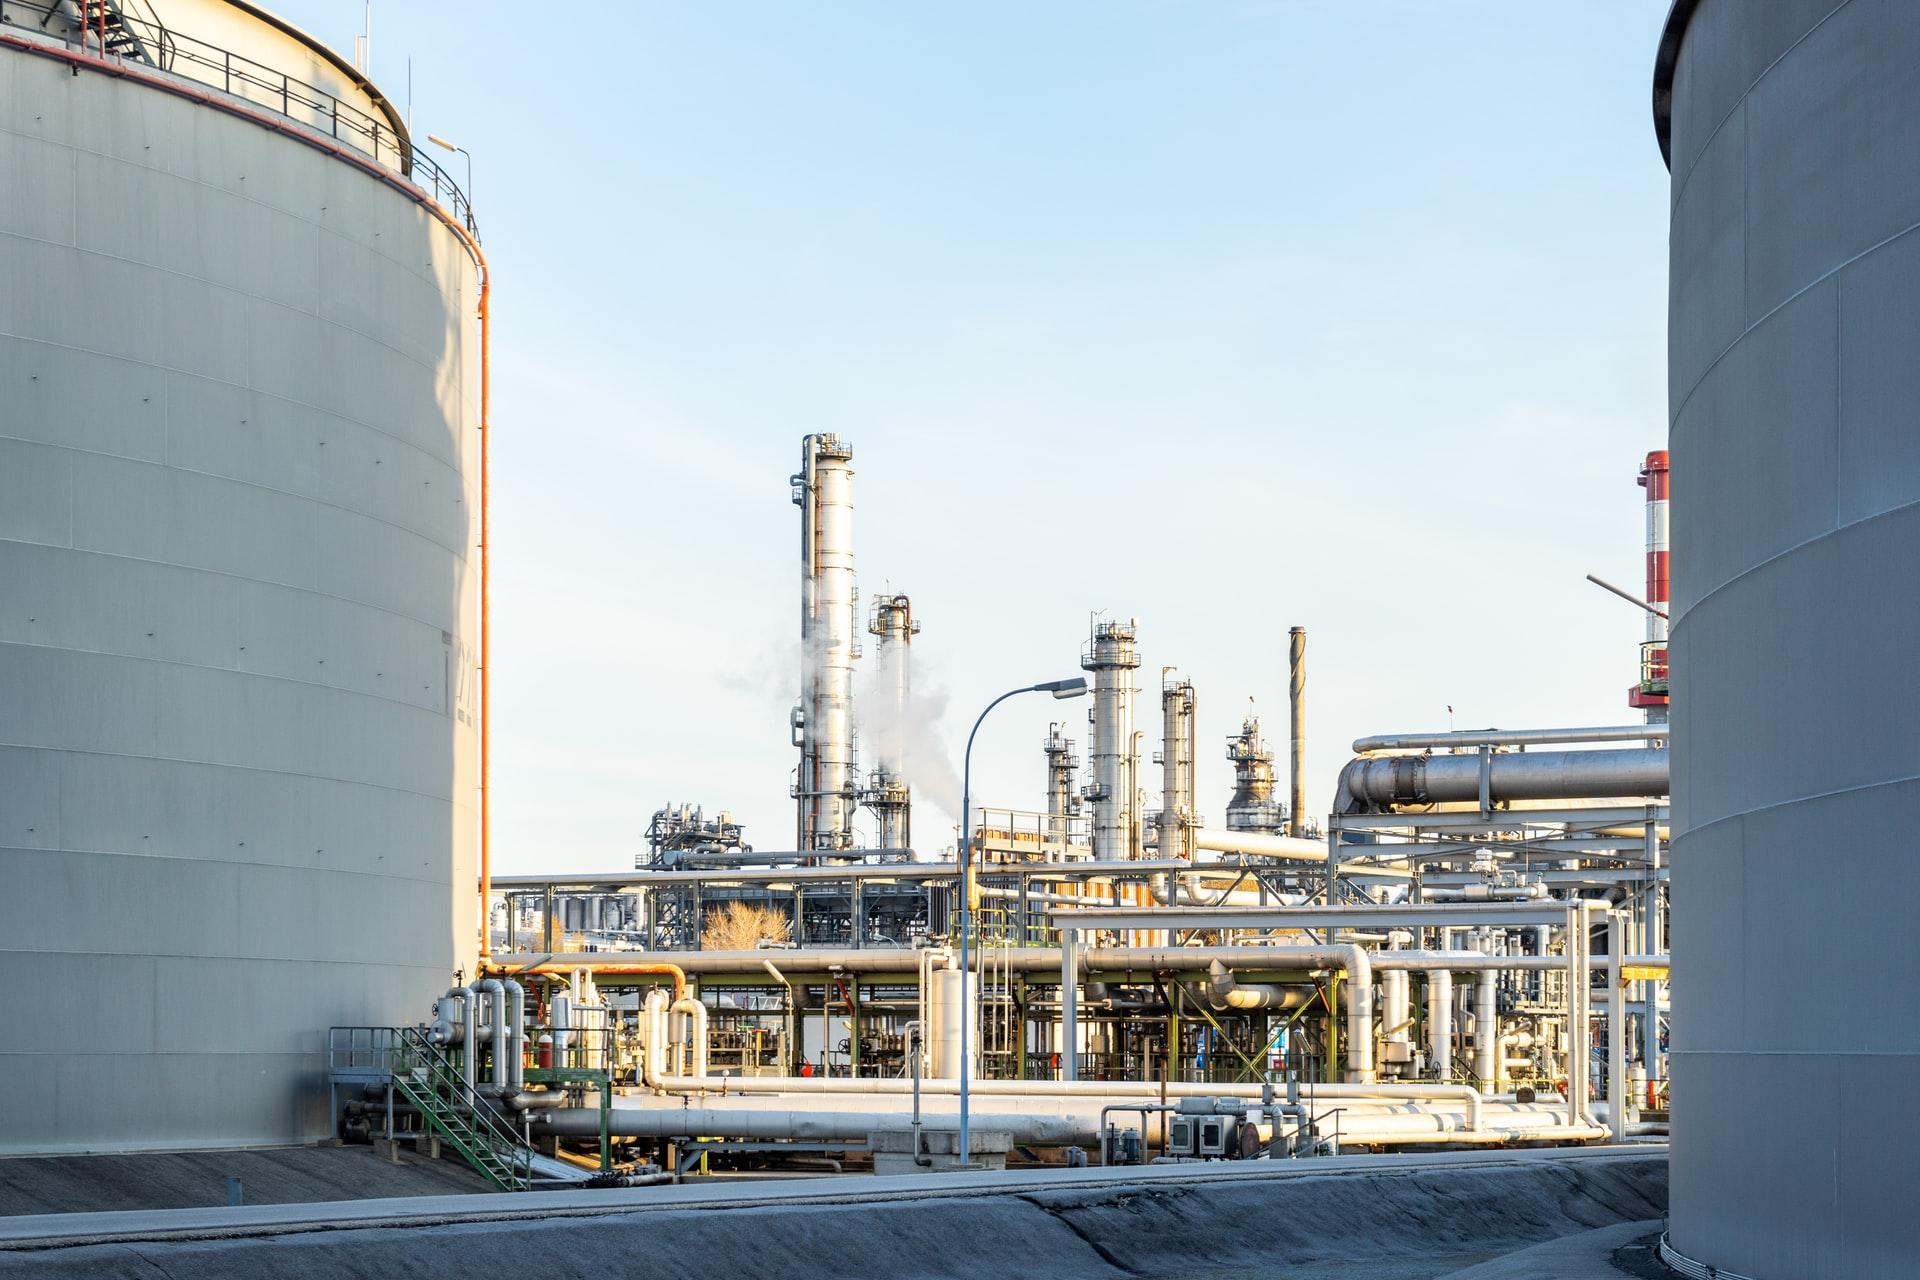 WA lithium refinery set to receive environmental approval